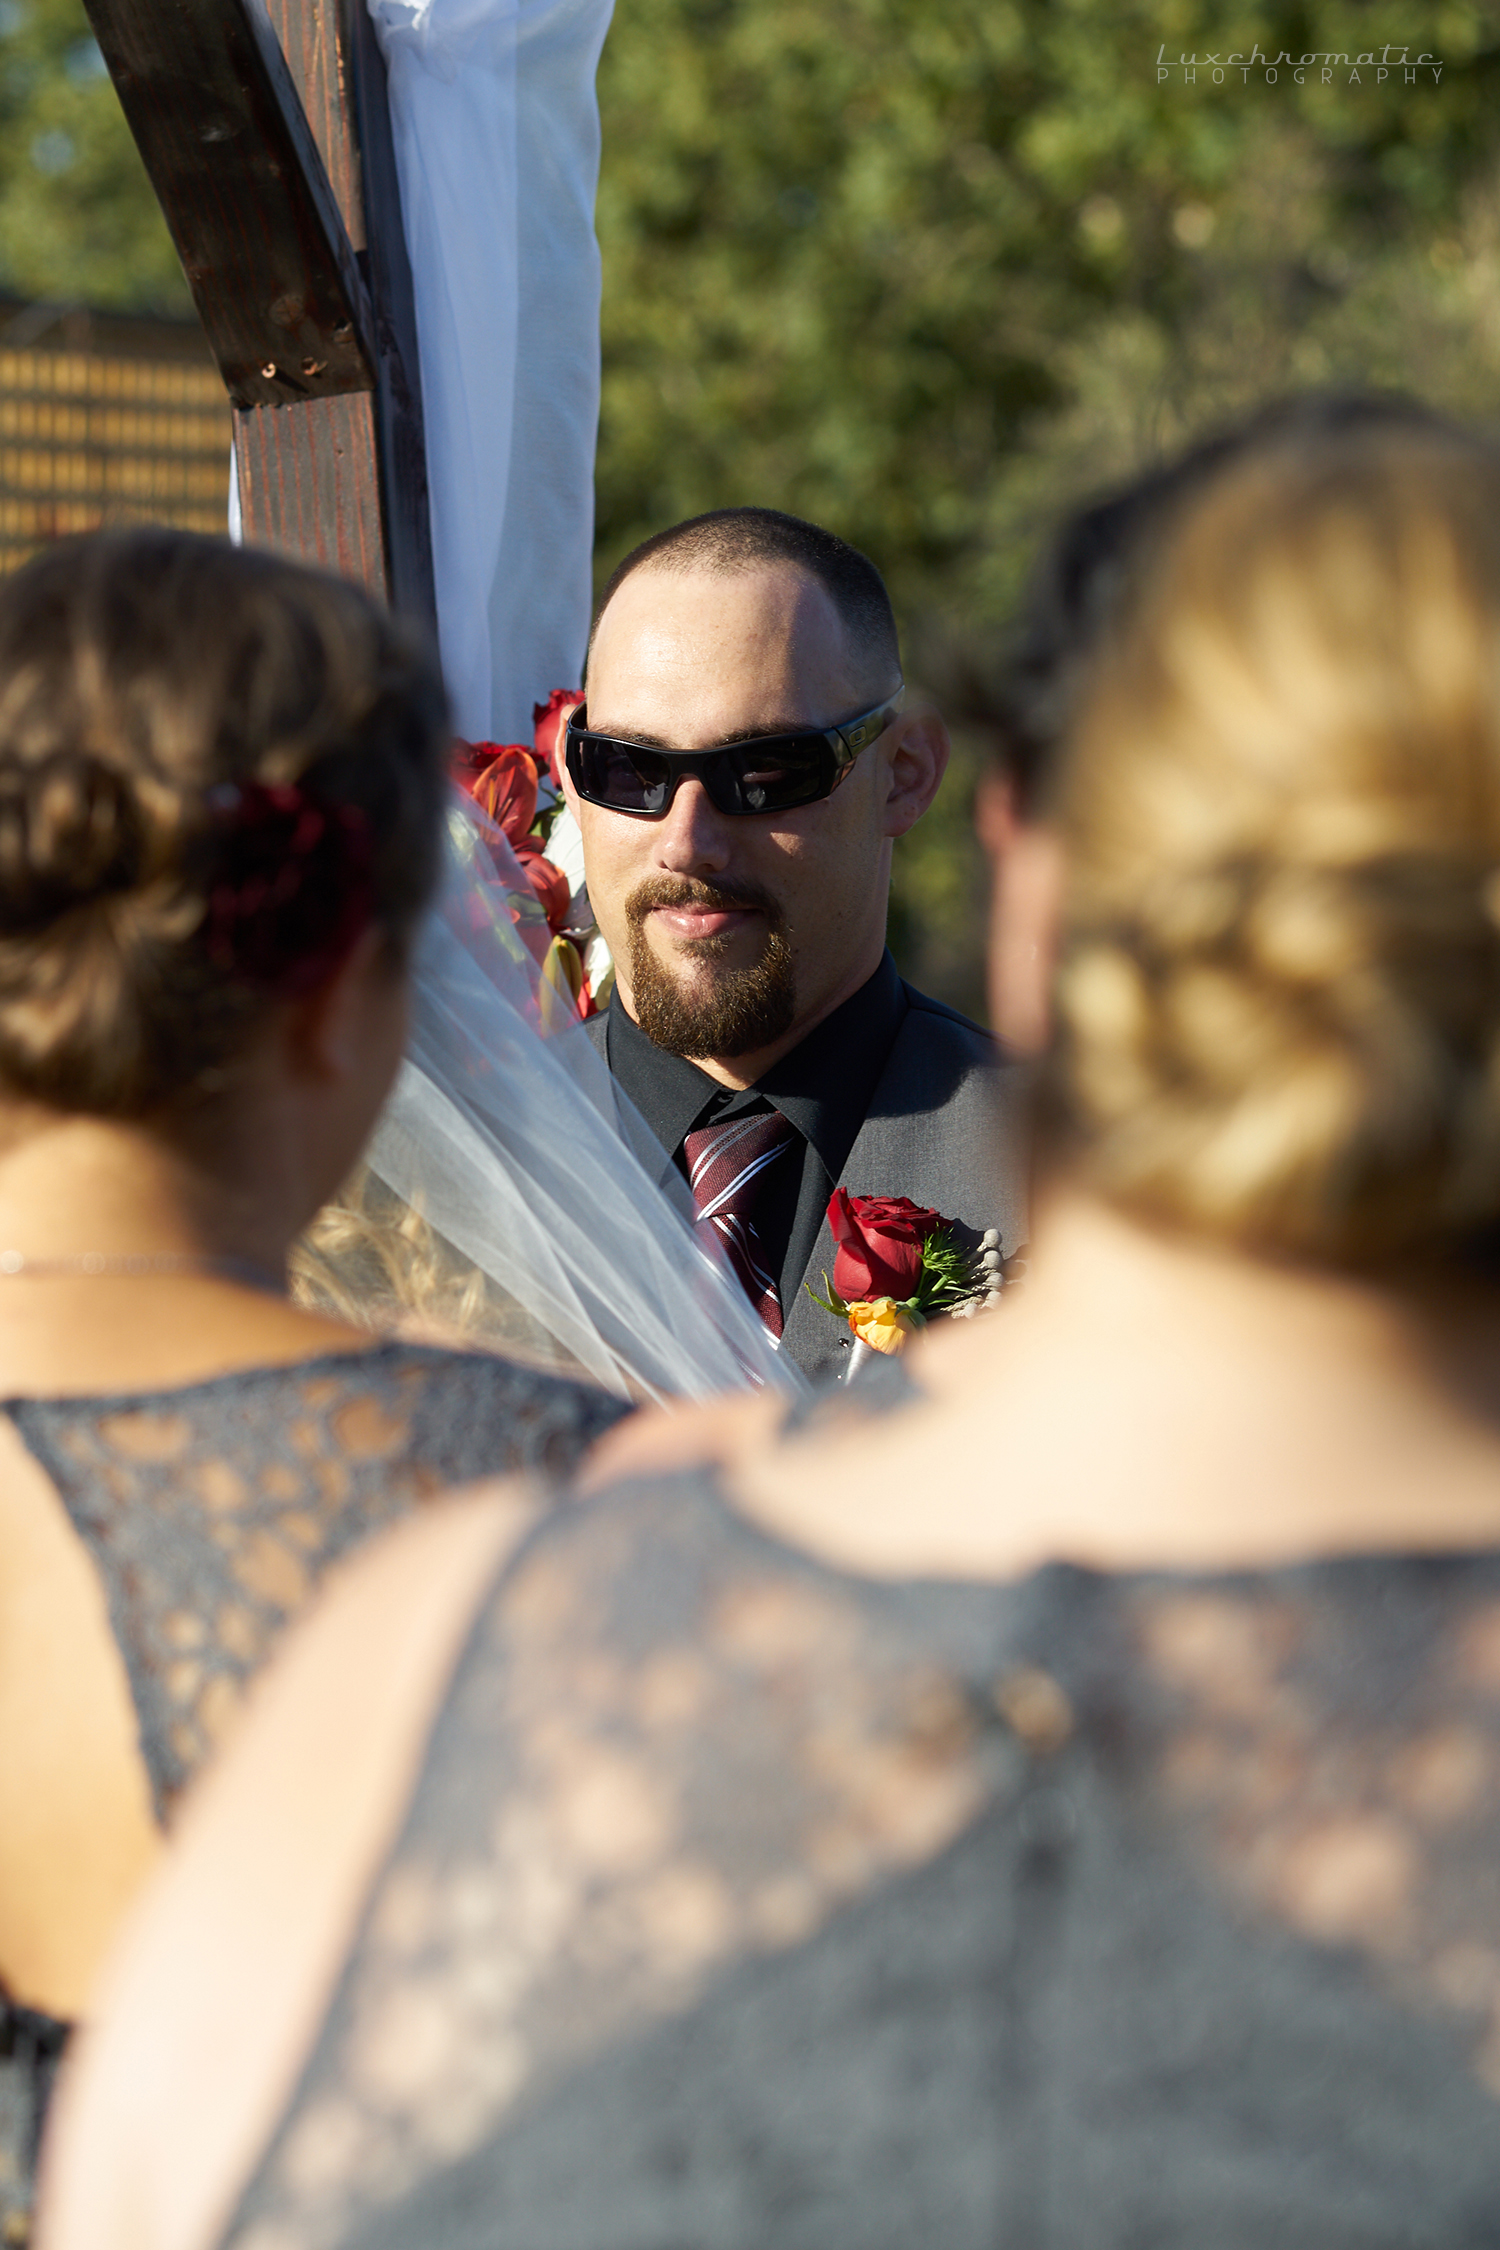 081217_Rachel_Chris_a0410-weddingdress-bride-weddingphotography-weddingphotographer-bridal-groom-wedding-engagementring-proposal-brides-diamondring-sonyalpha-sony-sonya9-sonya7rii-sanfrancisco-sf-bayarea-photographer-profoto-murrietas-well.jpg